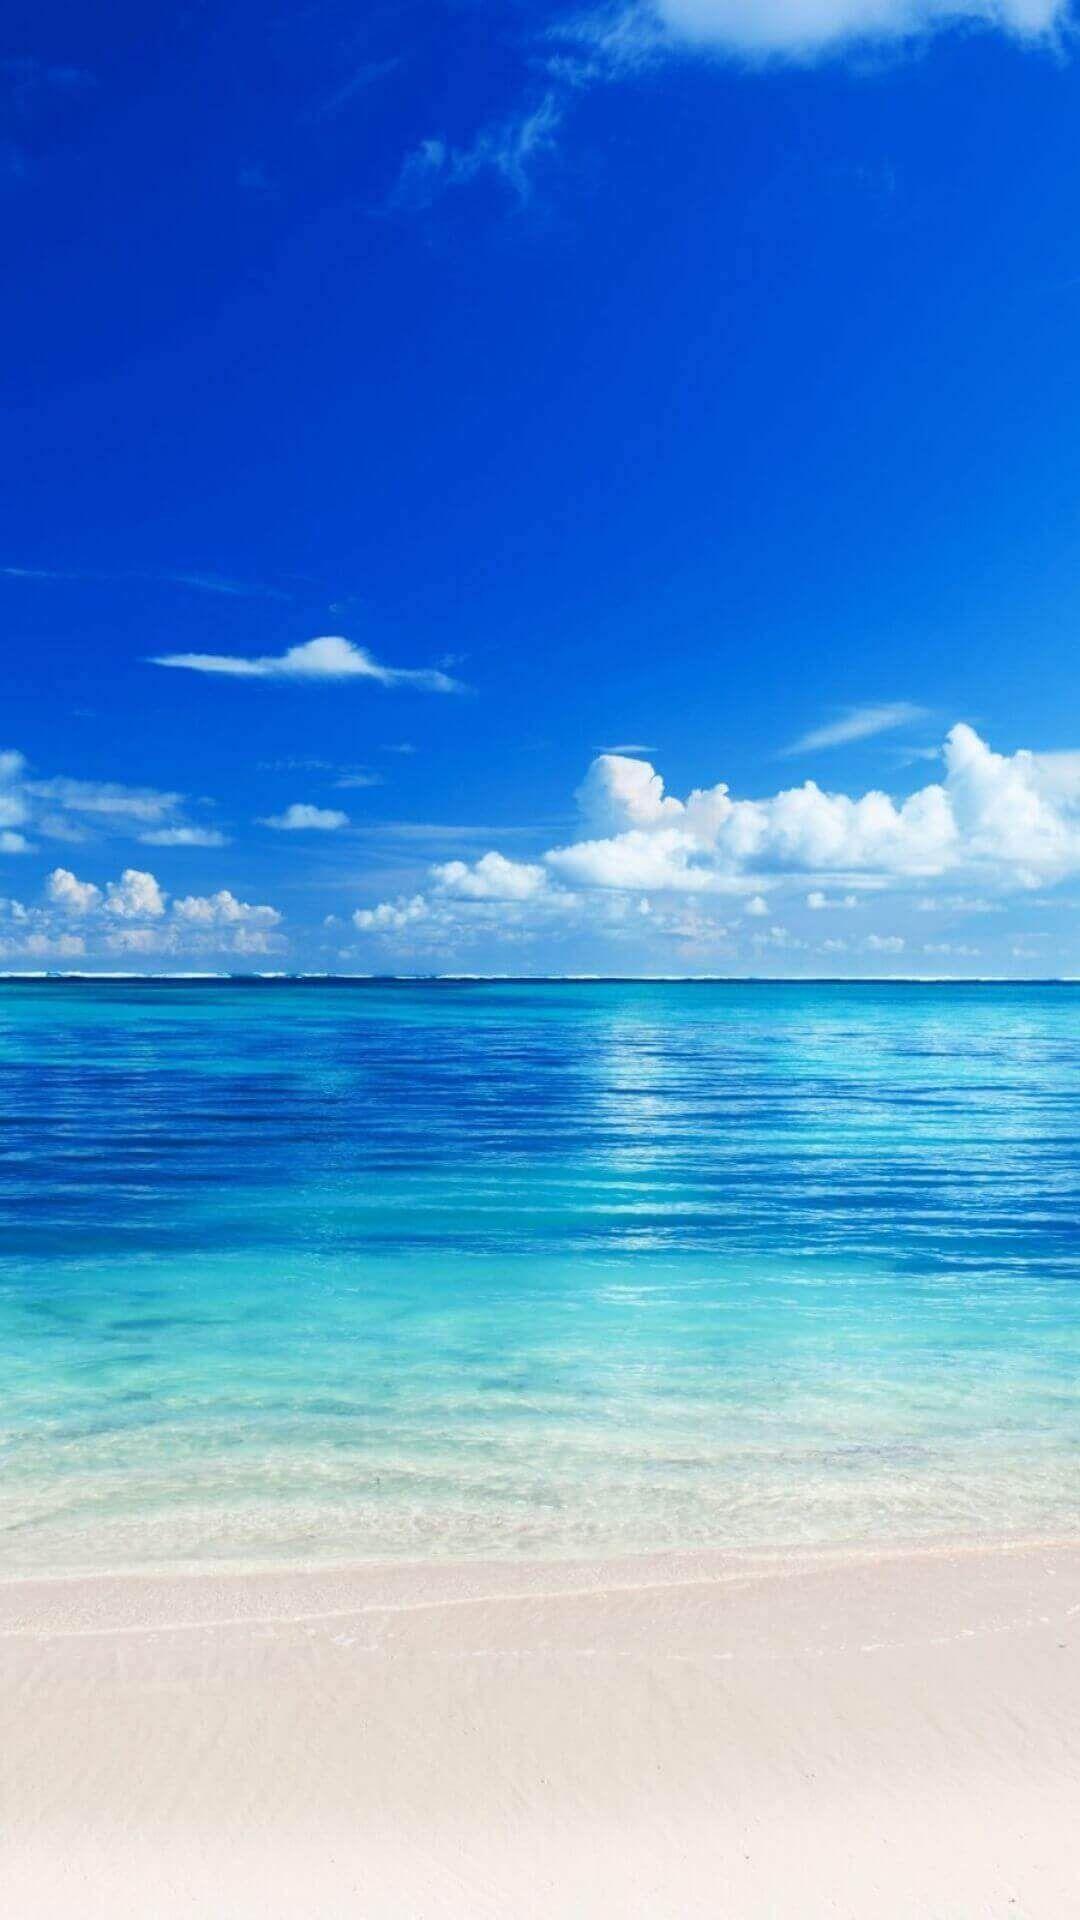 Beautiful Beach Iphone Wallpaper Beach Wallpaper Beautiful Landscapes Ocean Wallpaper